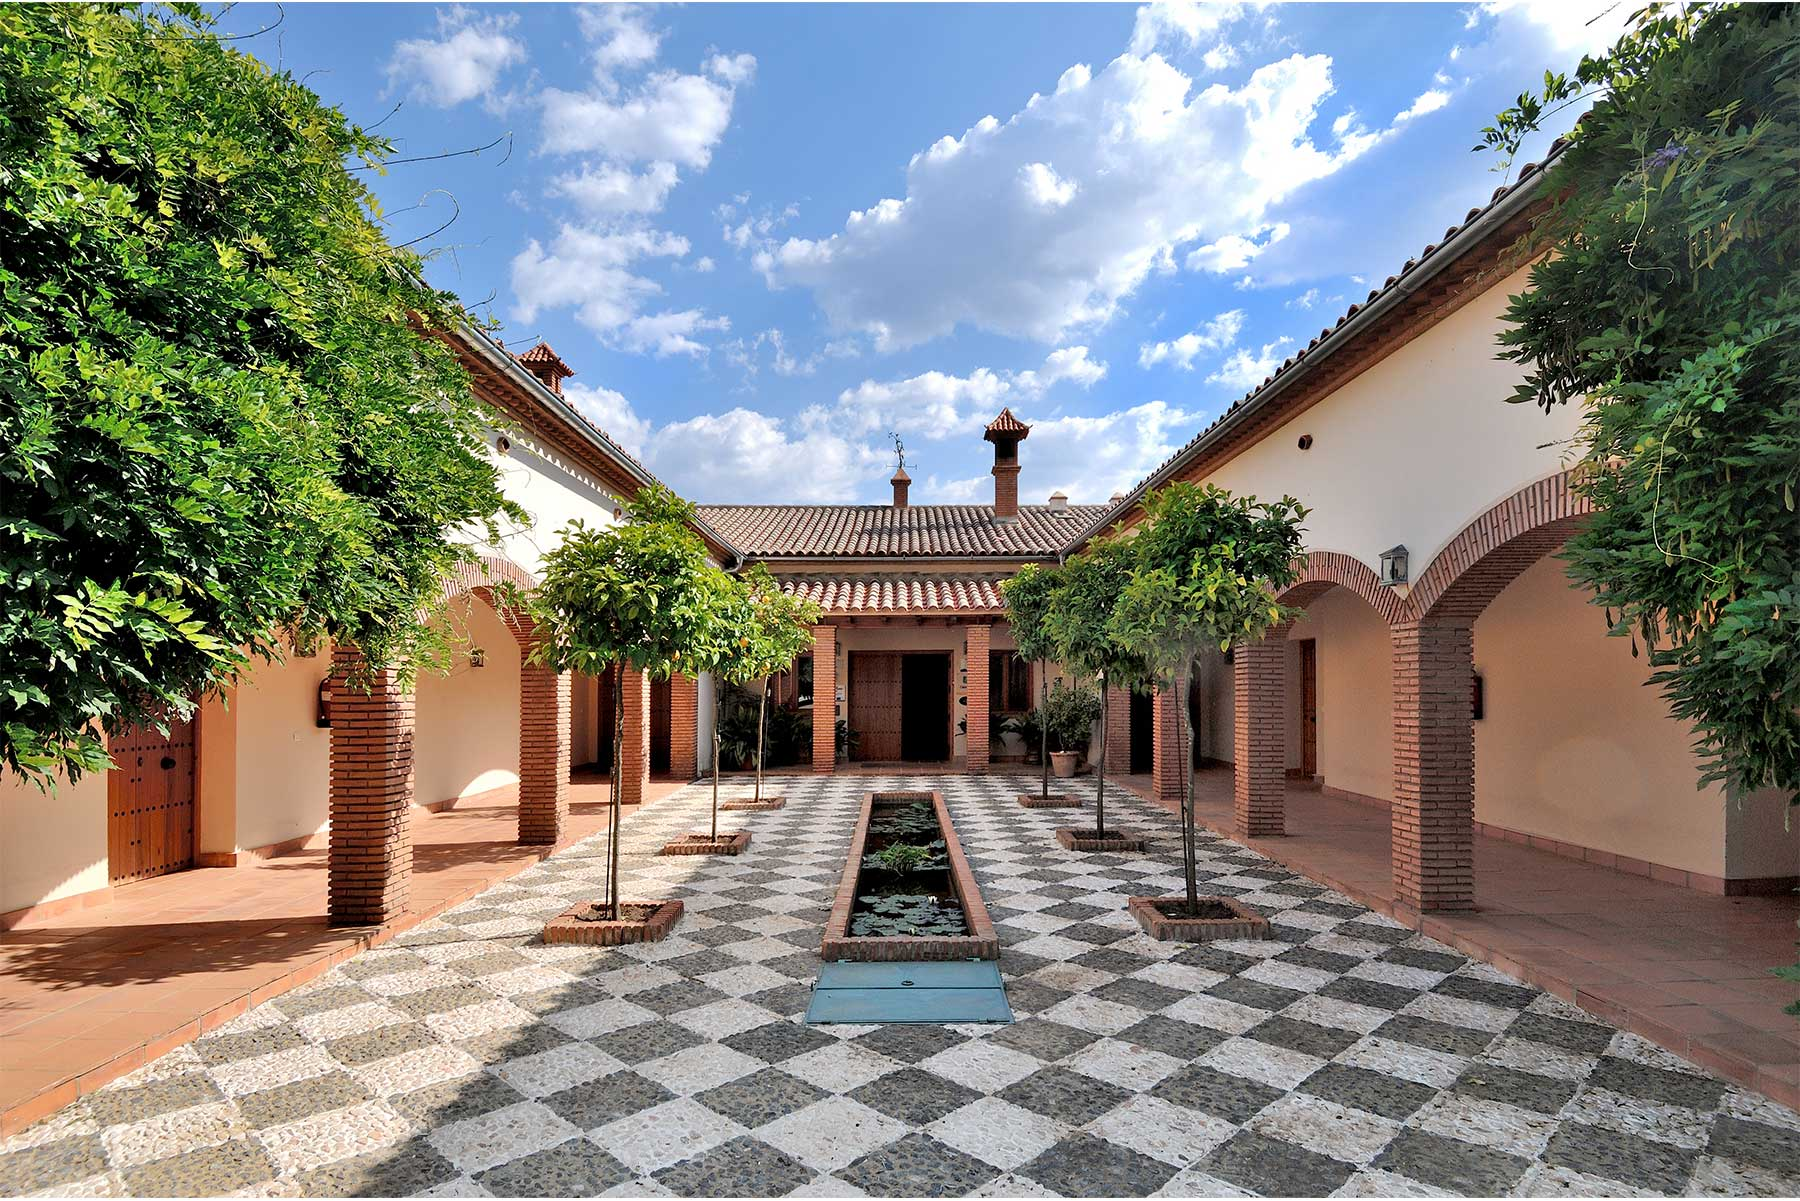 Paladar y Tomar: Spain hotel curators